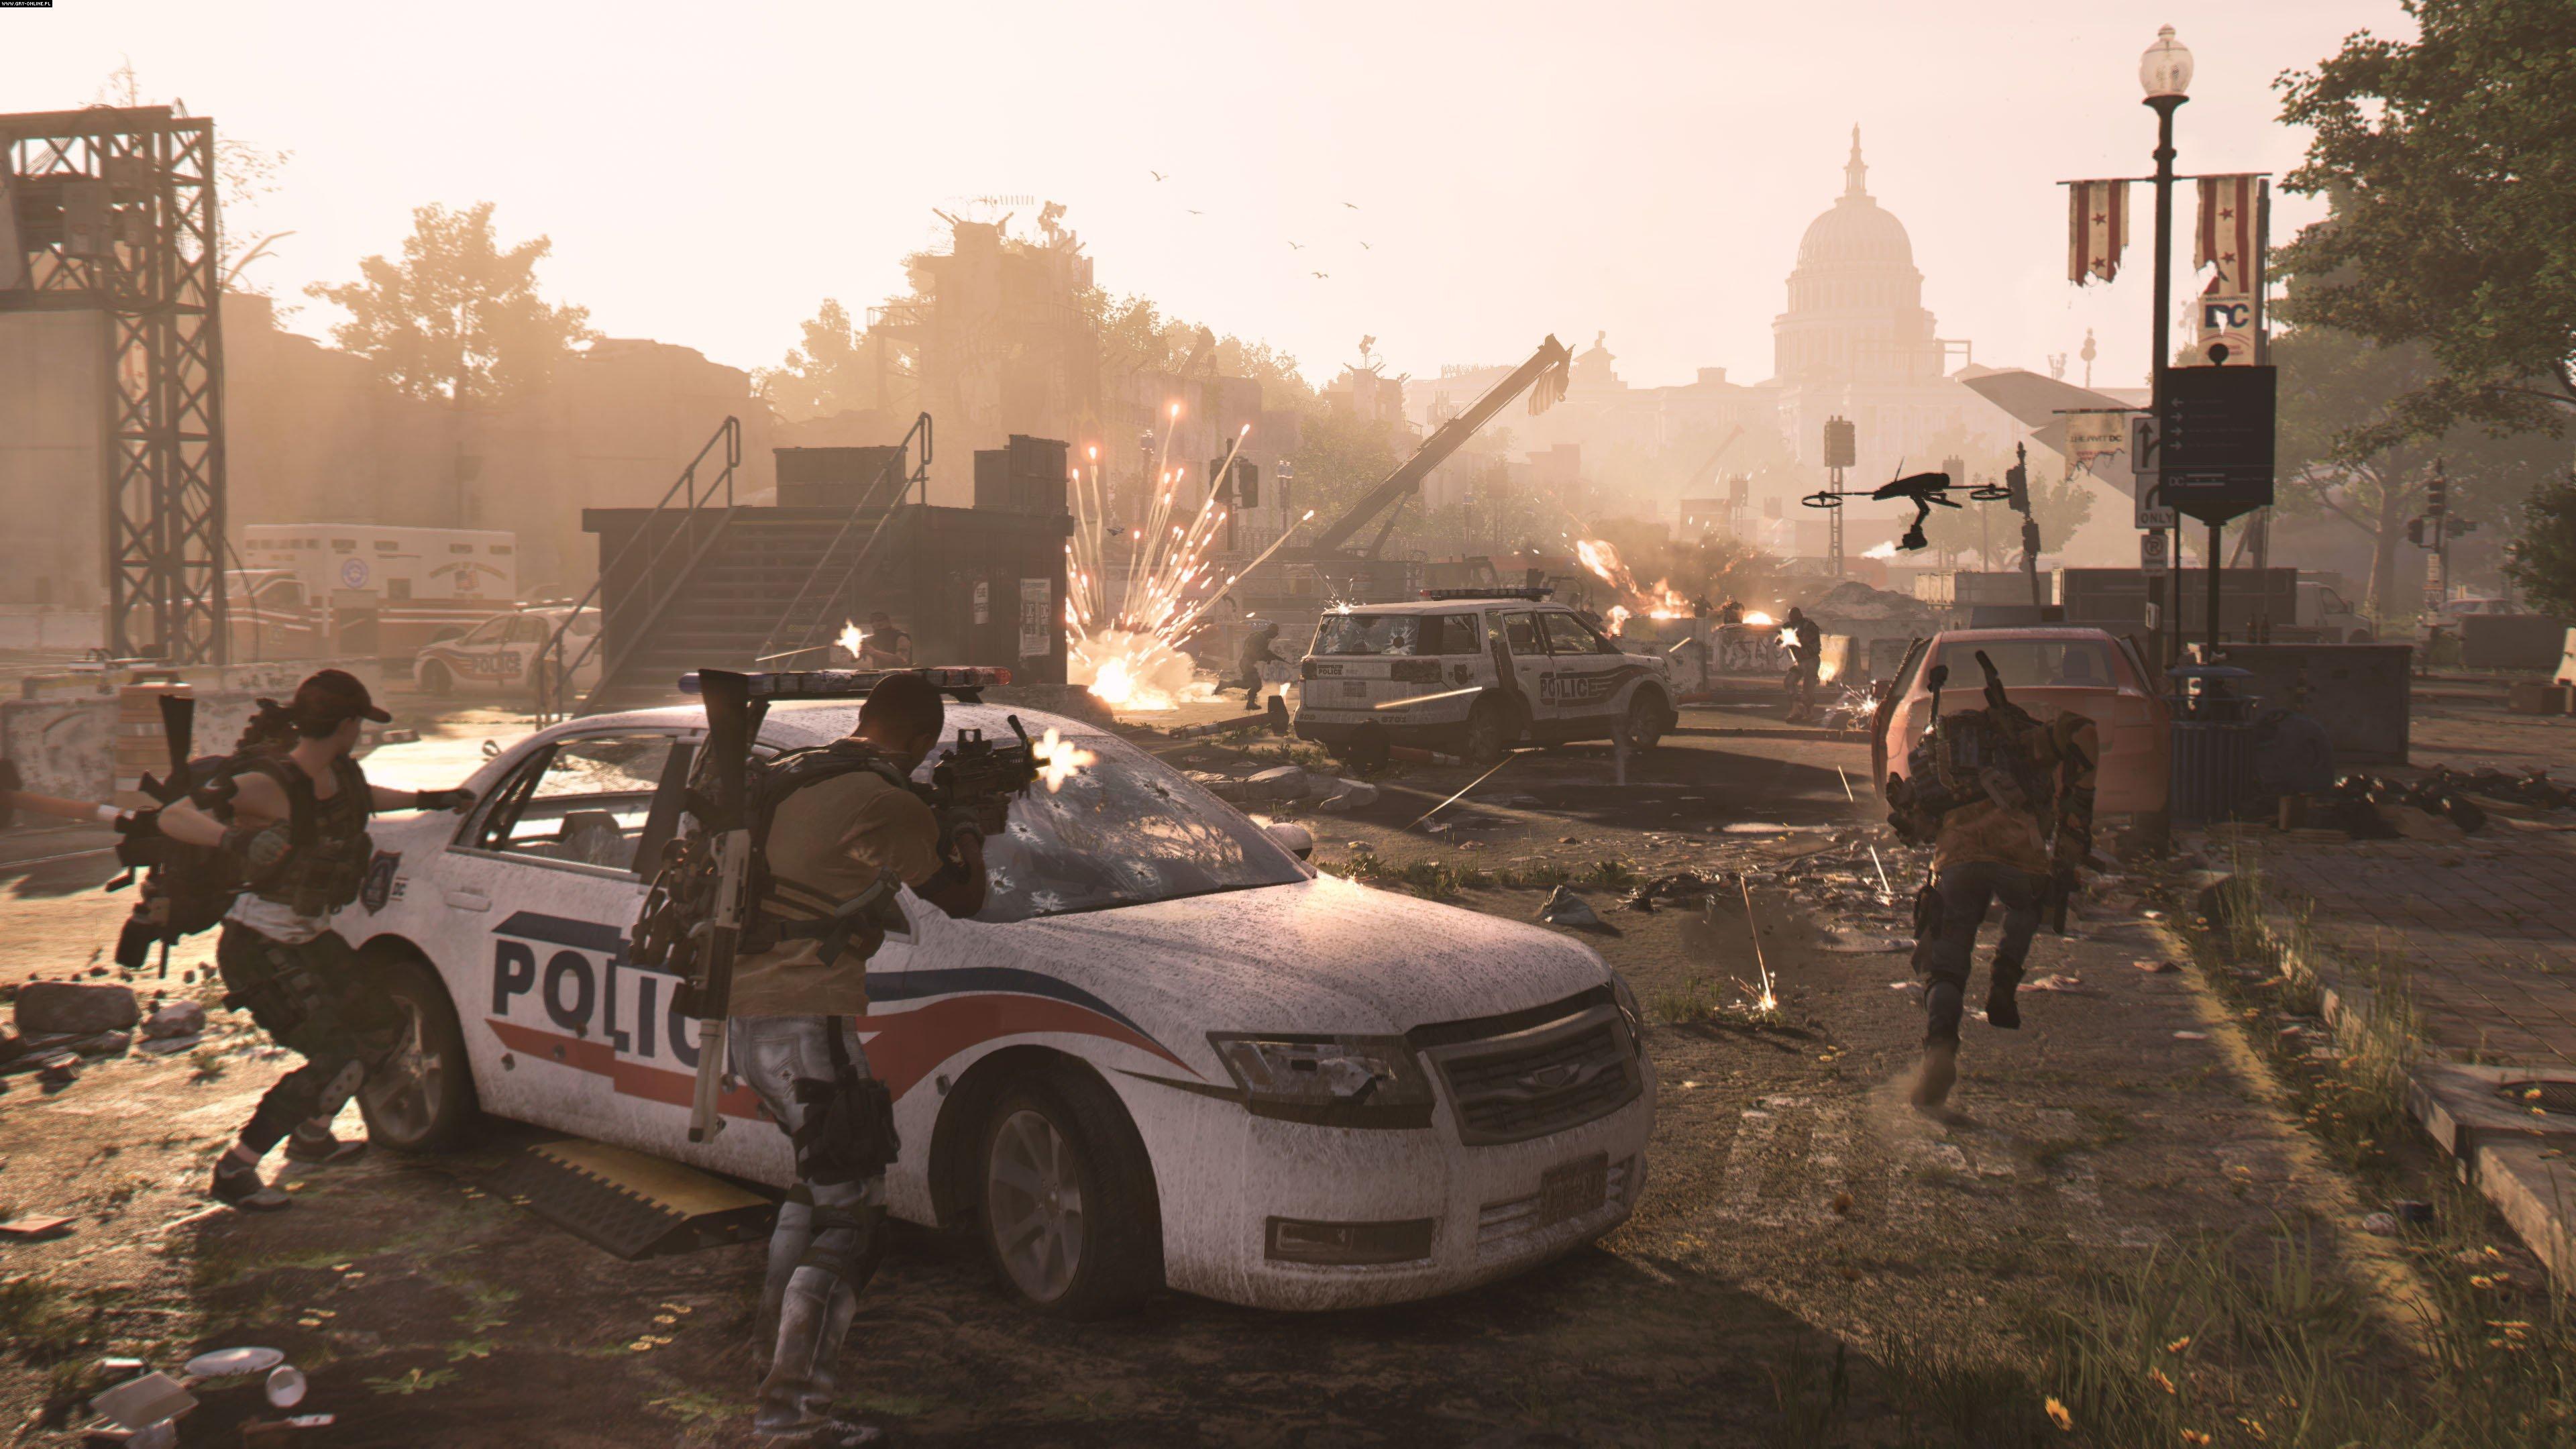 Tom Clancy's The Division 2 PC, PS4, XONE Games Image 13/23, Massive Entertainment / Ubisoft Massive, Ubisoft